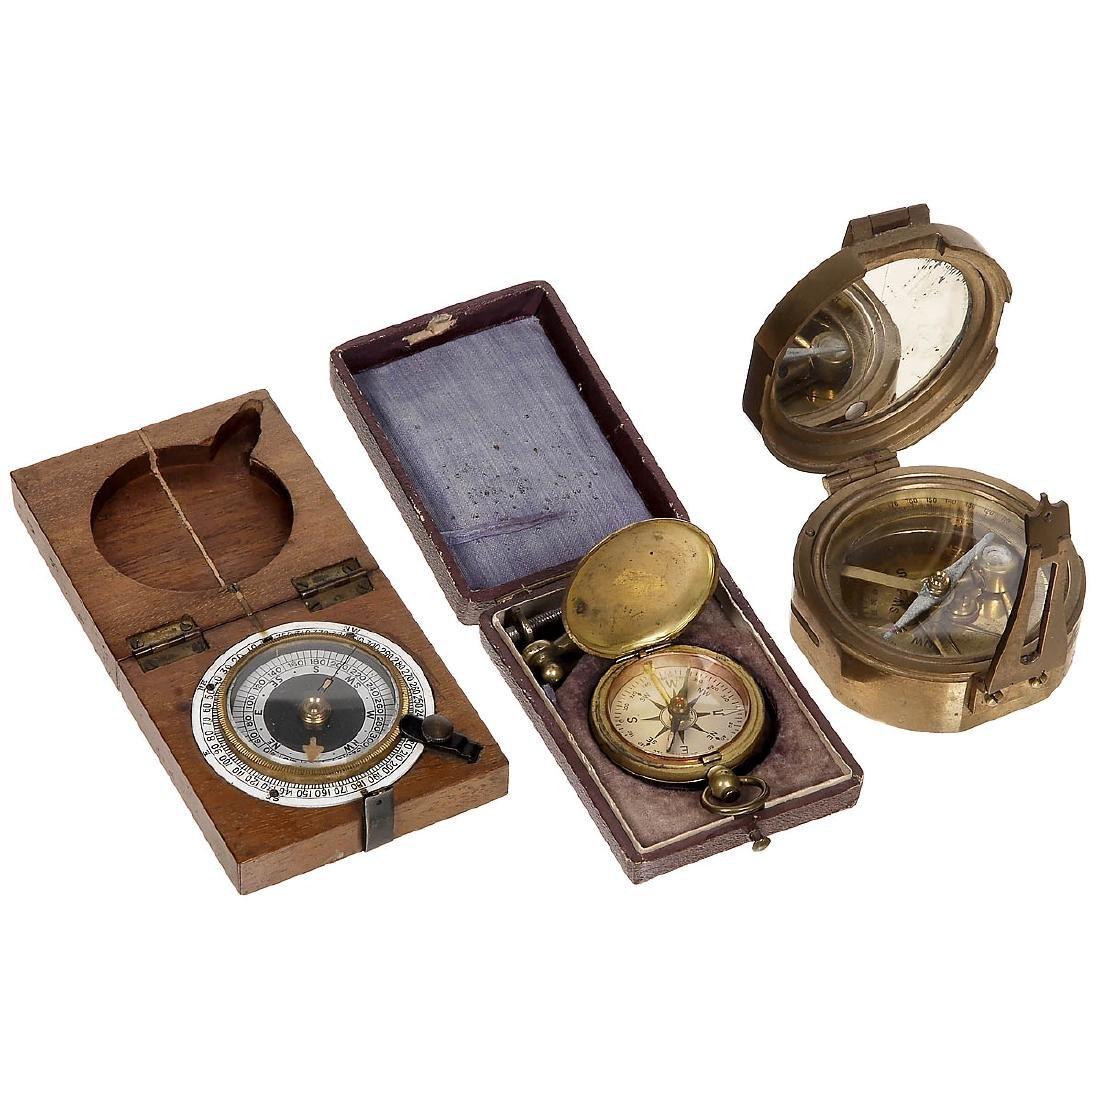 3 Compasses